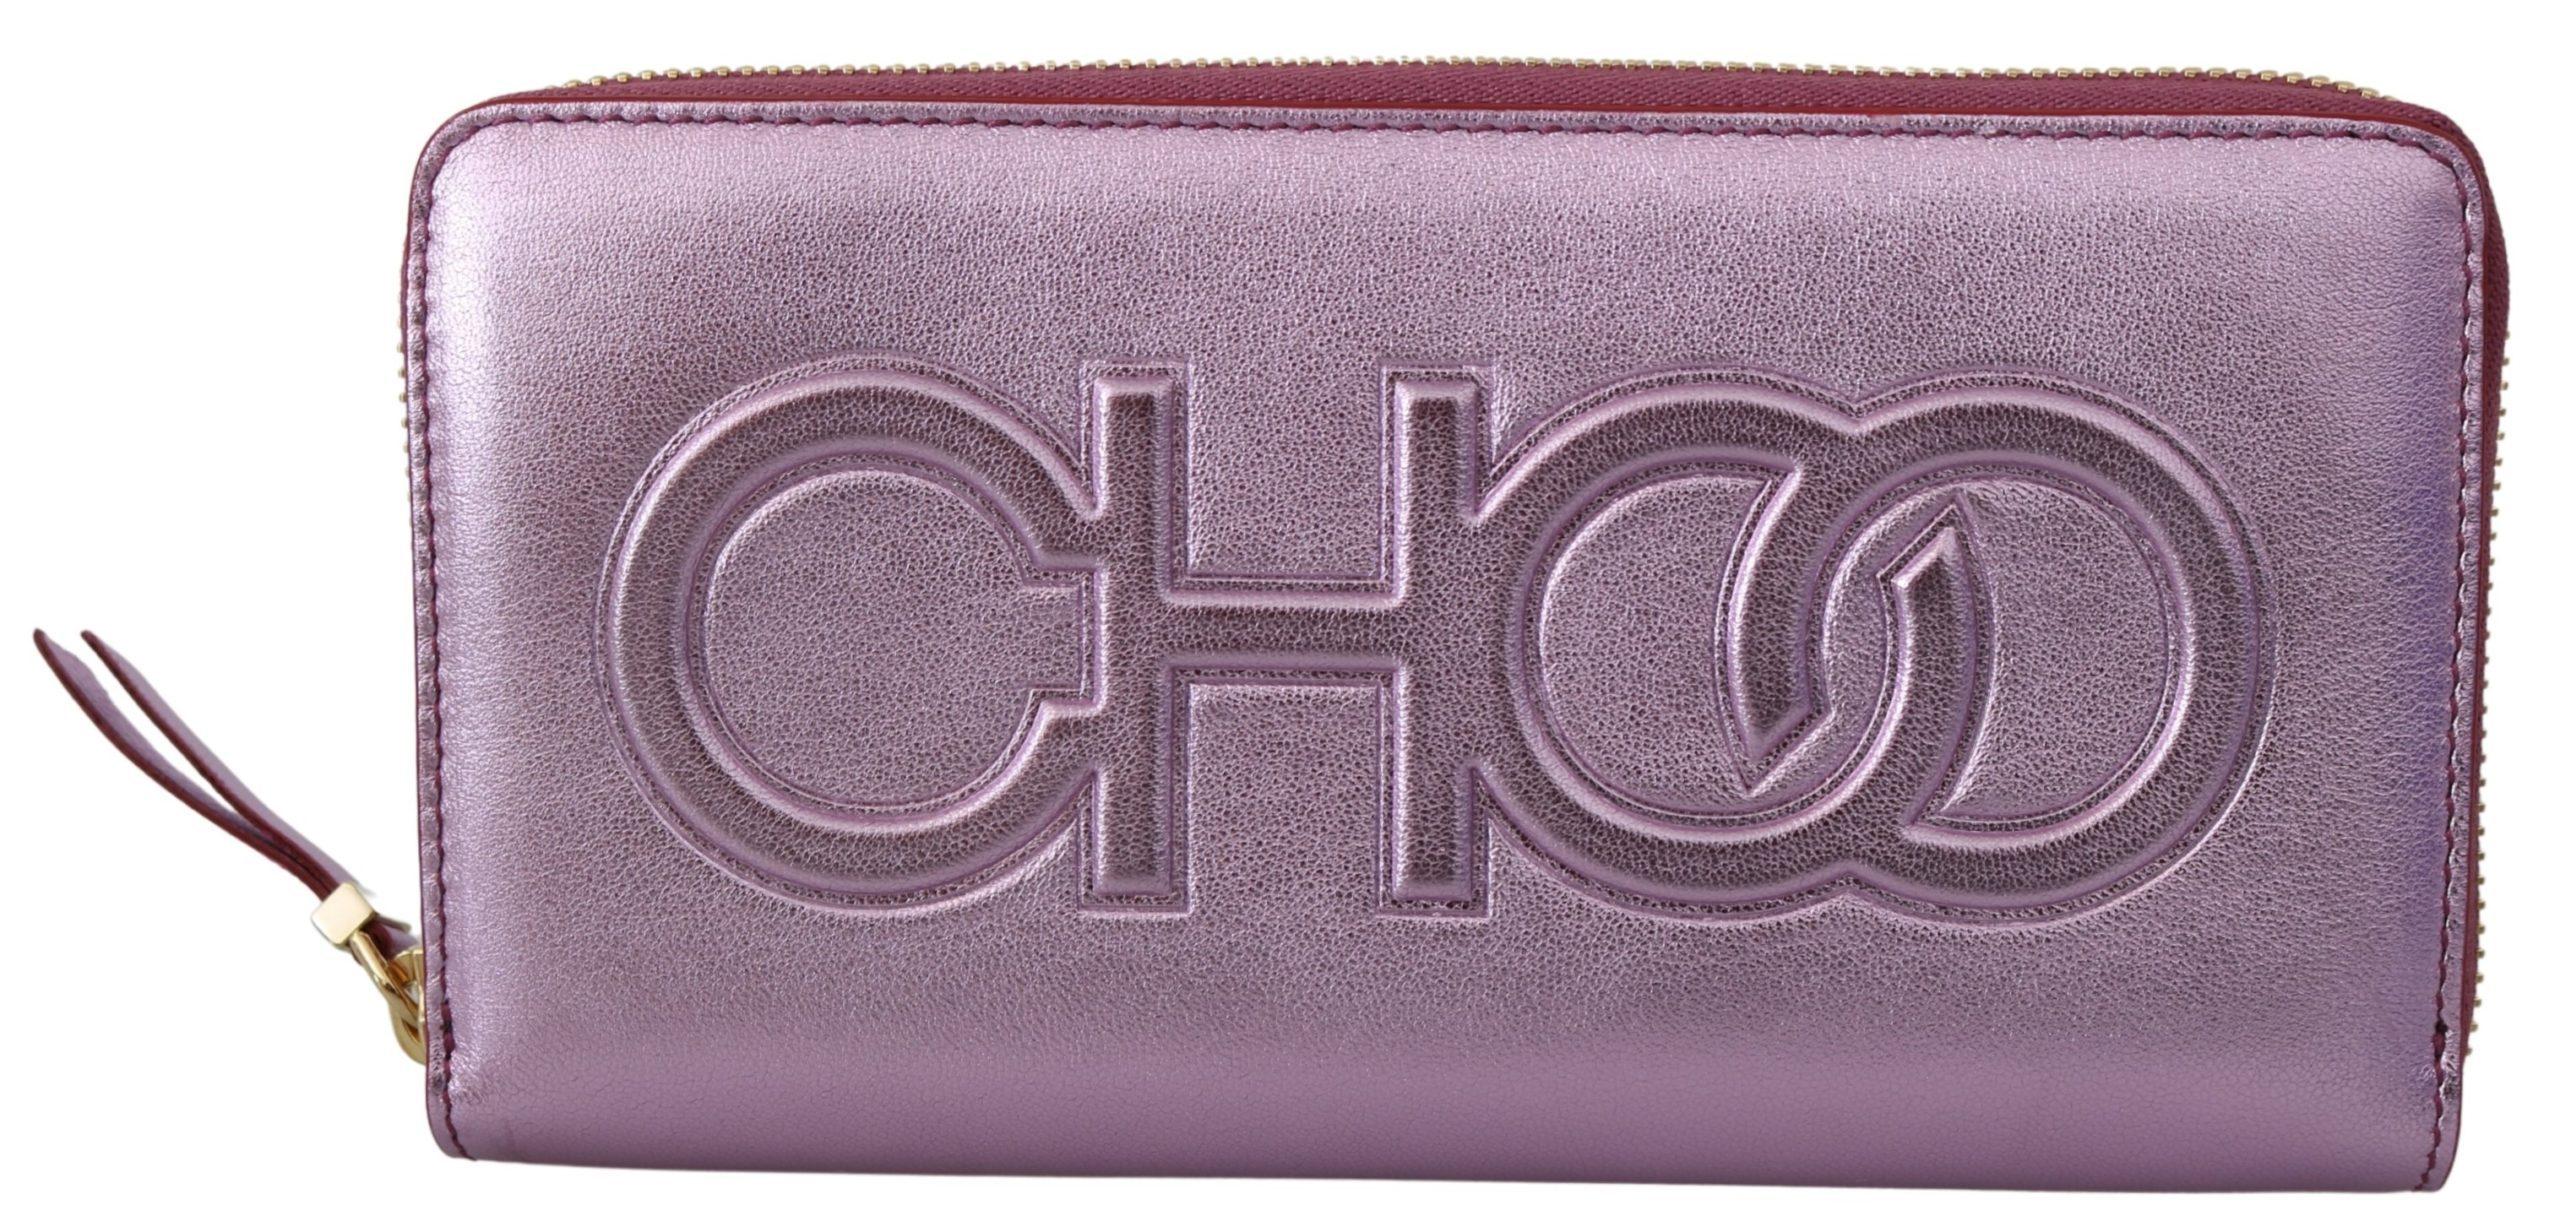 Jimmy Choo Women's Bettina Wallet Lilac 1436050